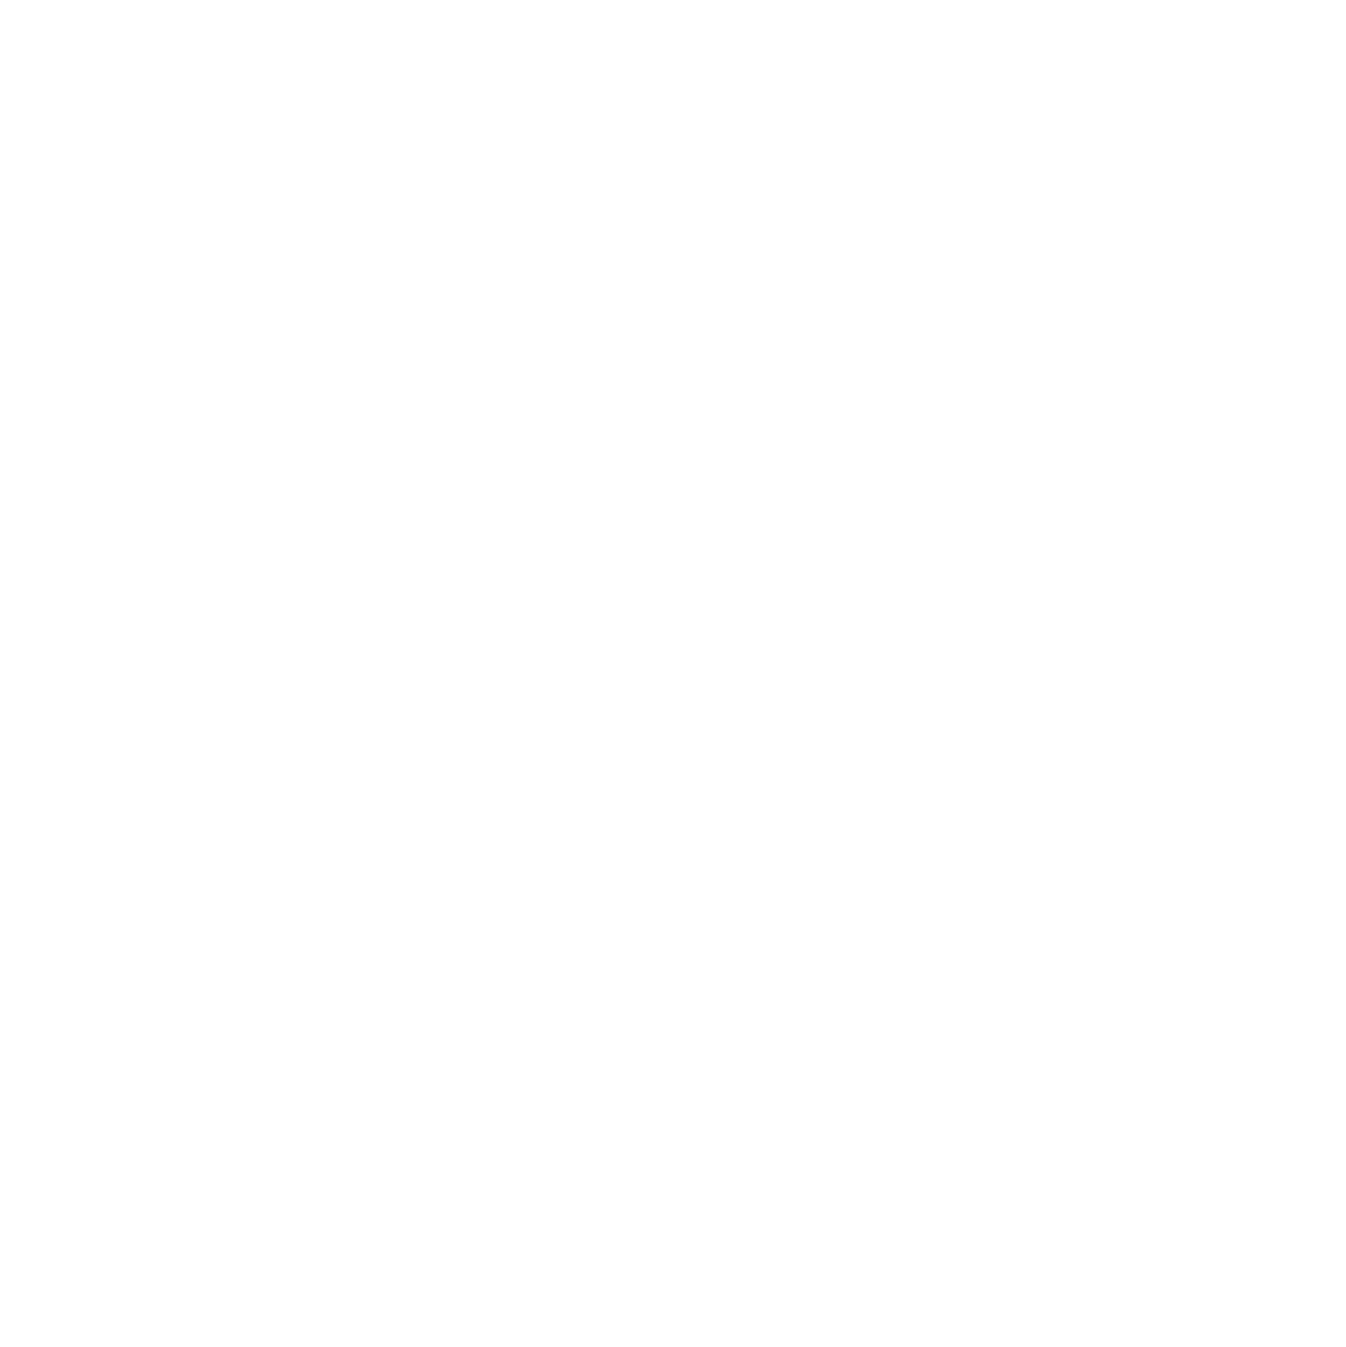 Arán Kilkenny Logo in white